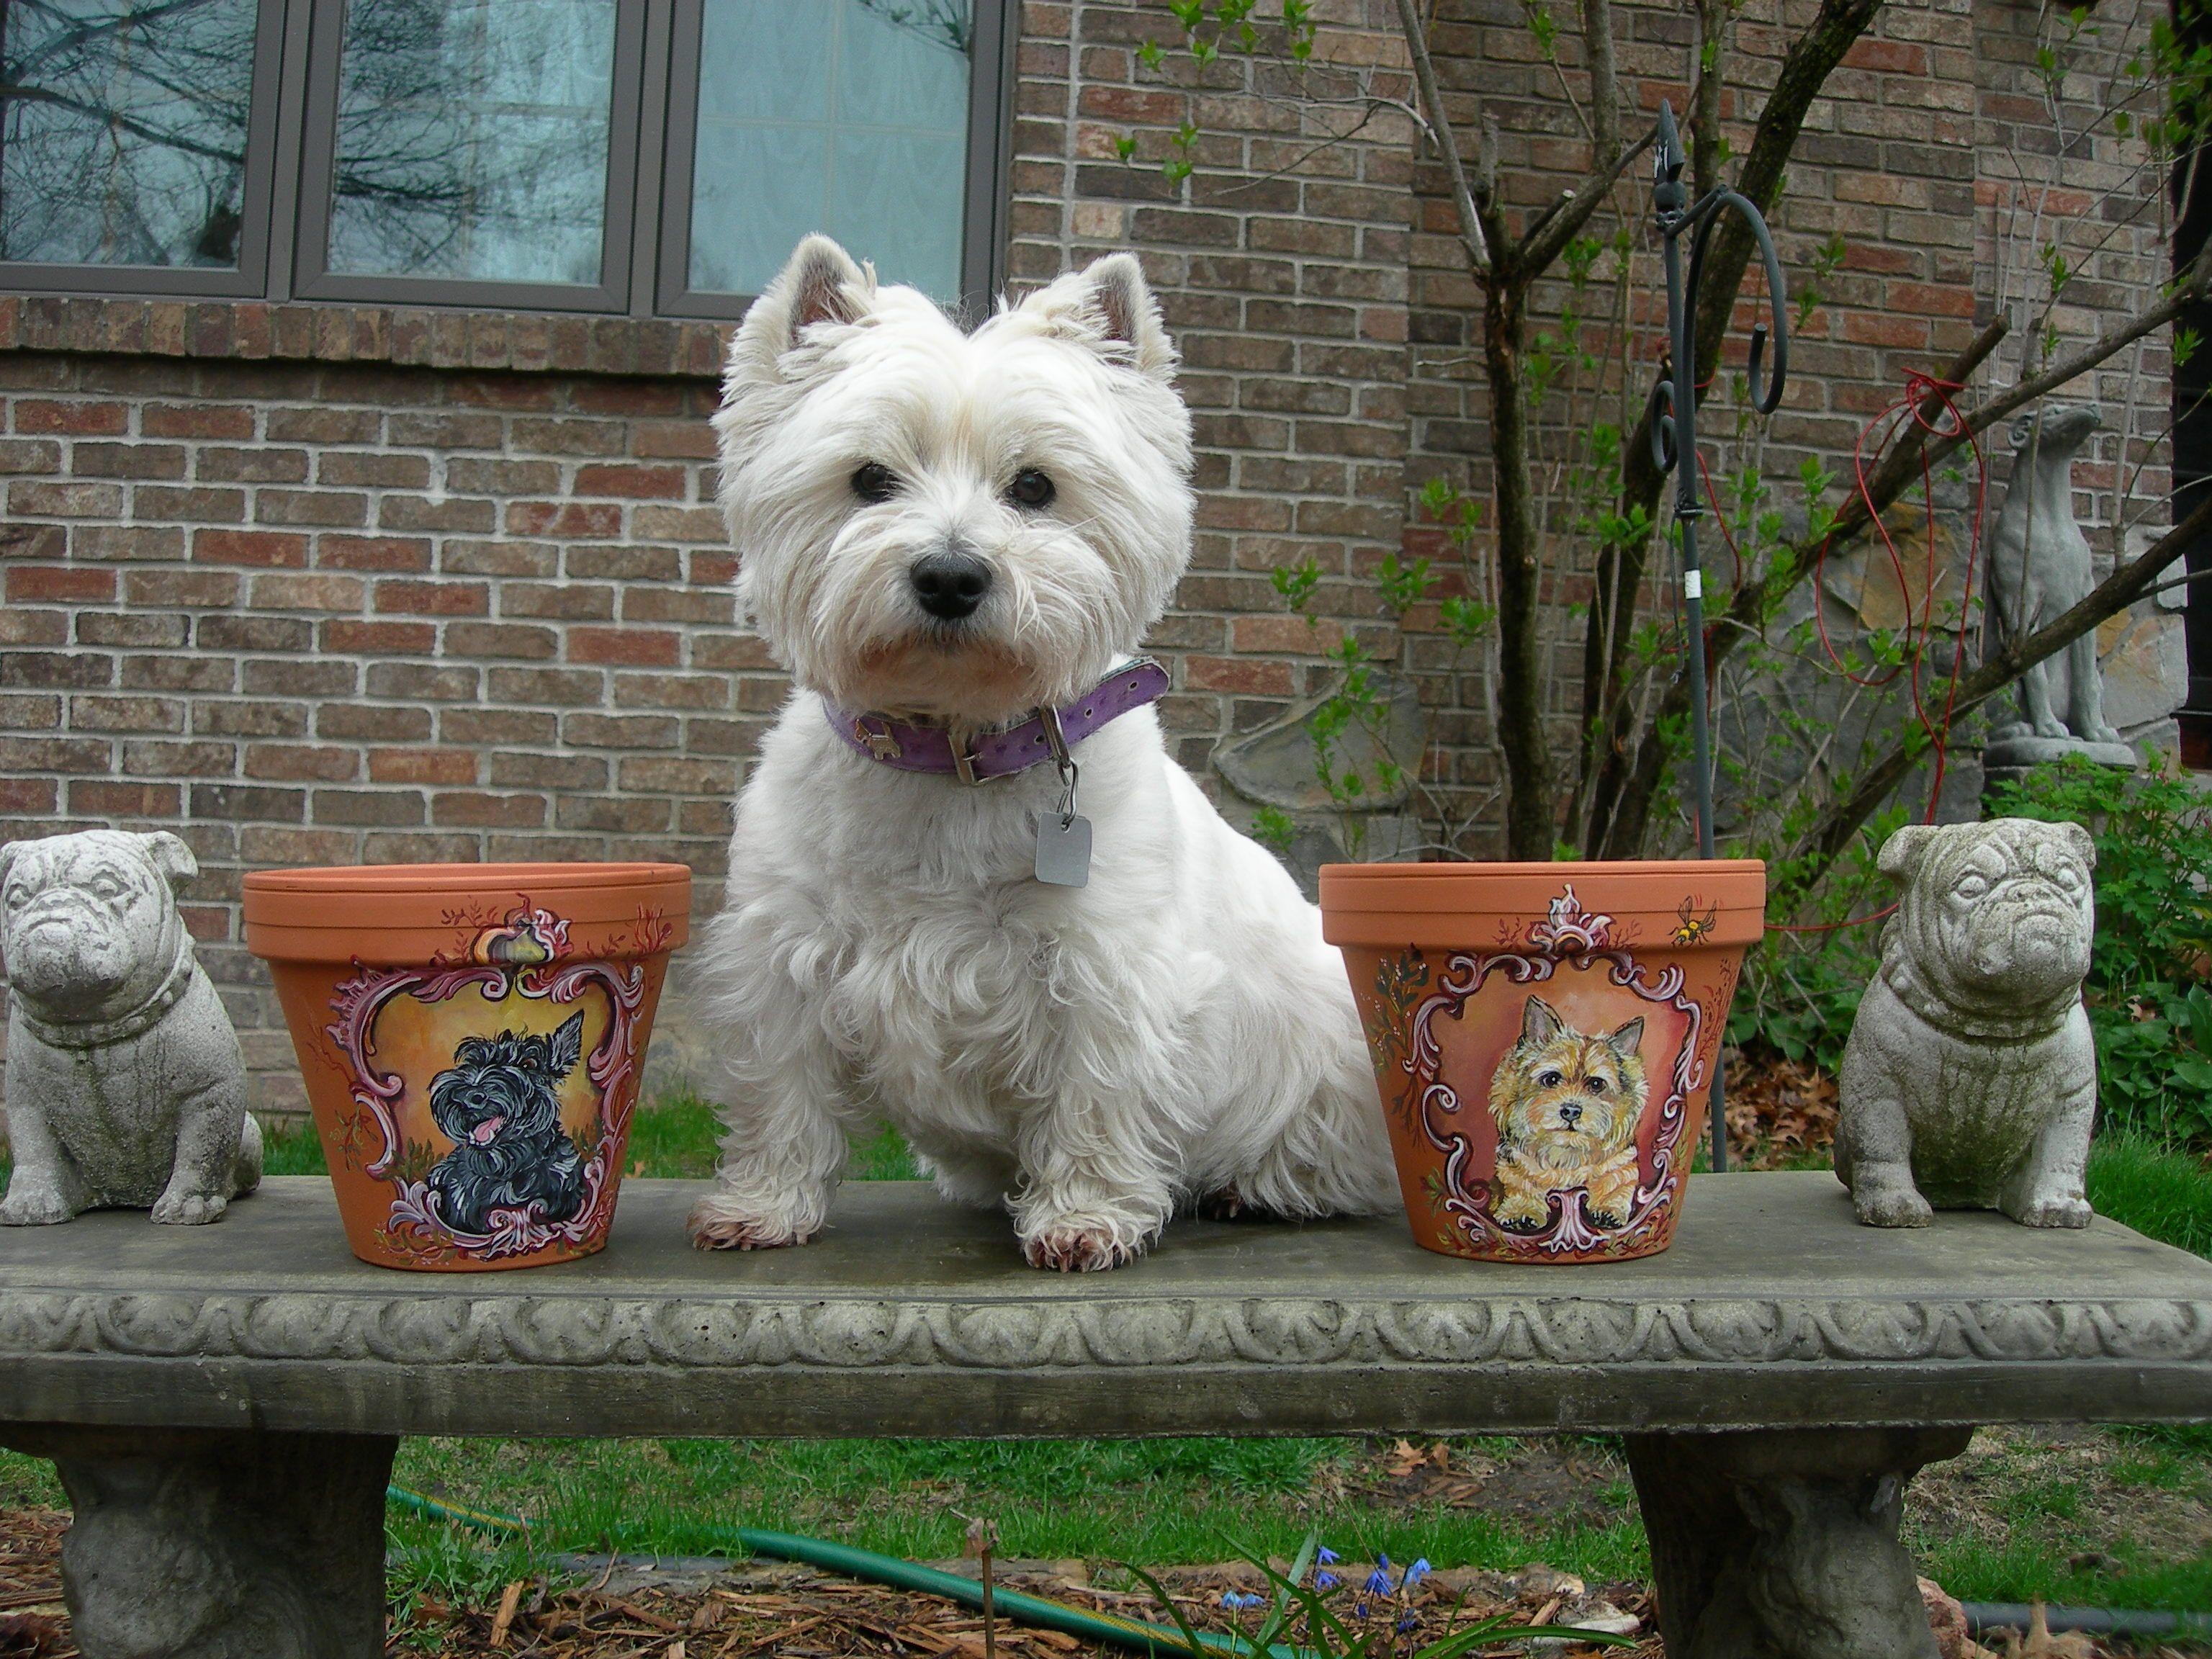 Paint Me Next White Dog Images Westie Terrier Dog Images